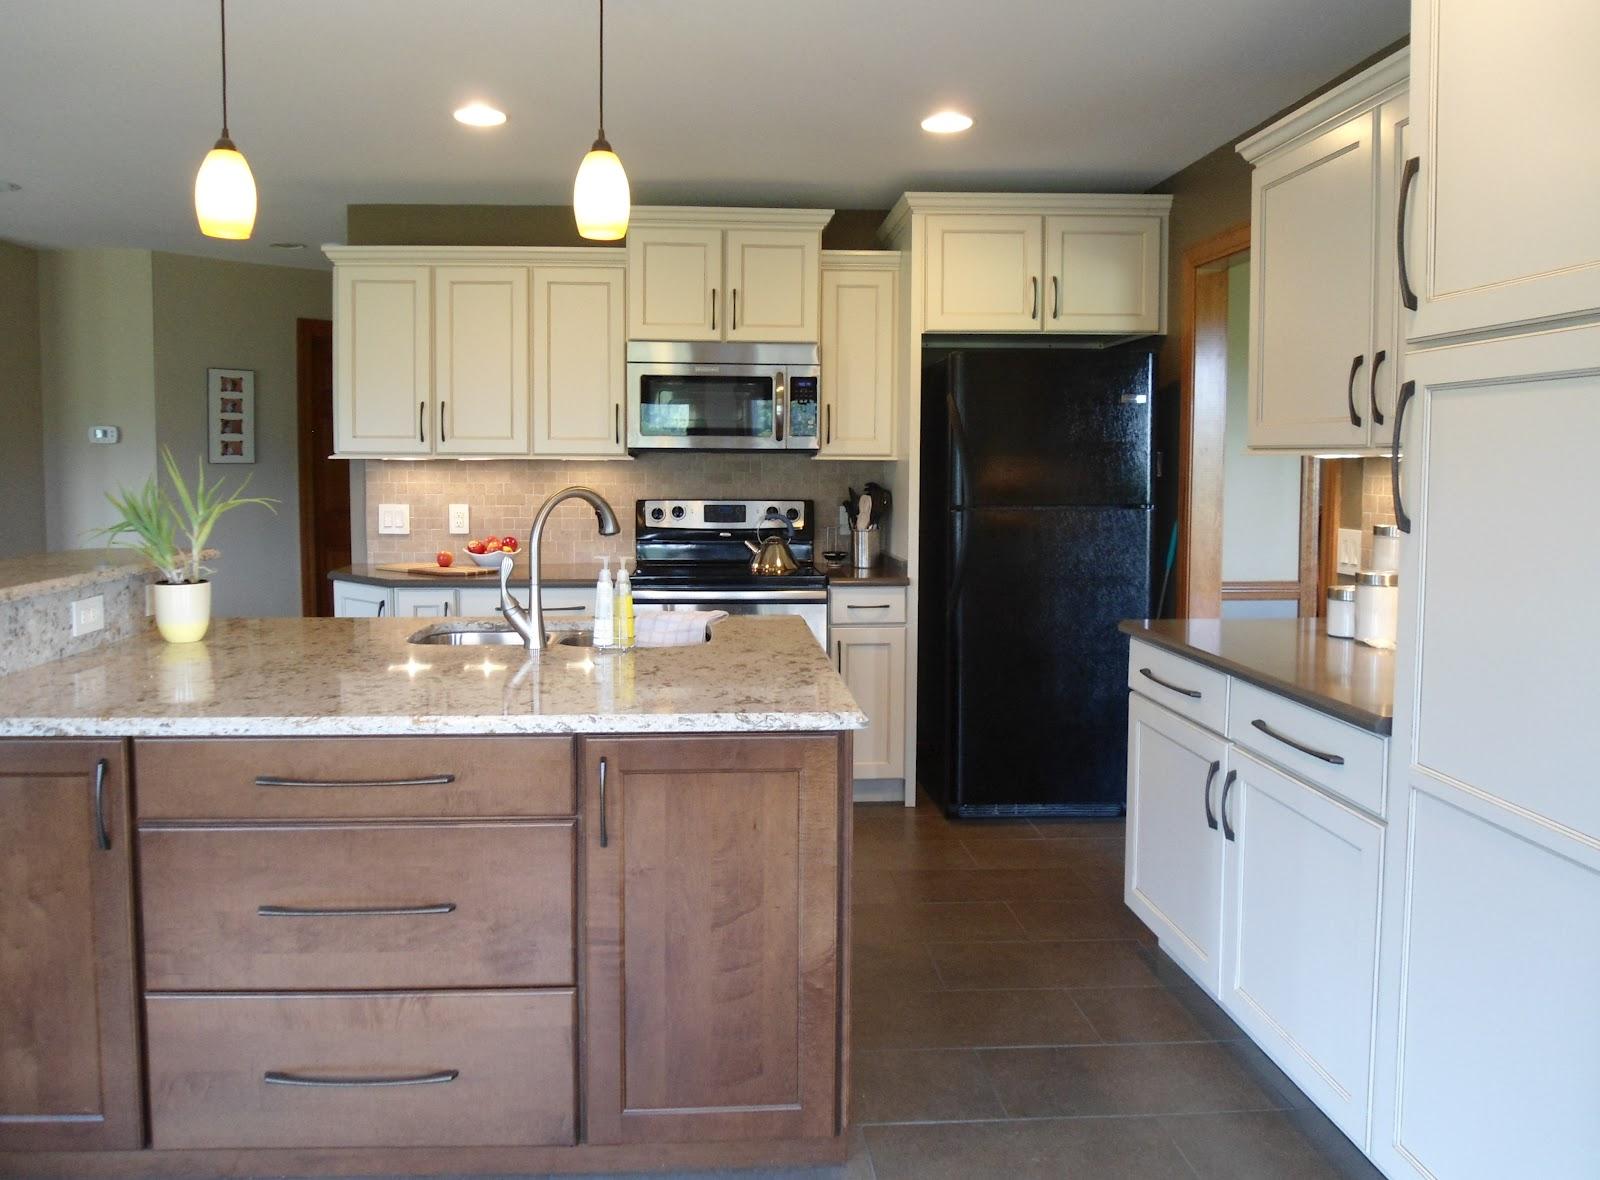 Lowe's Kitchen Cabinets